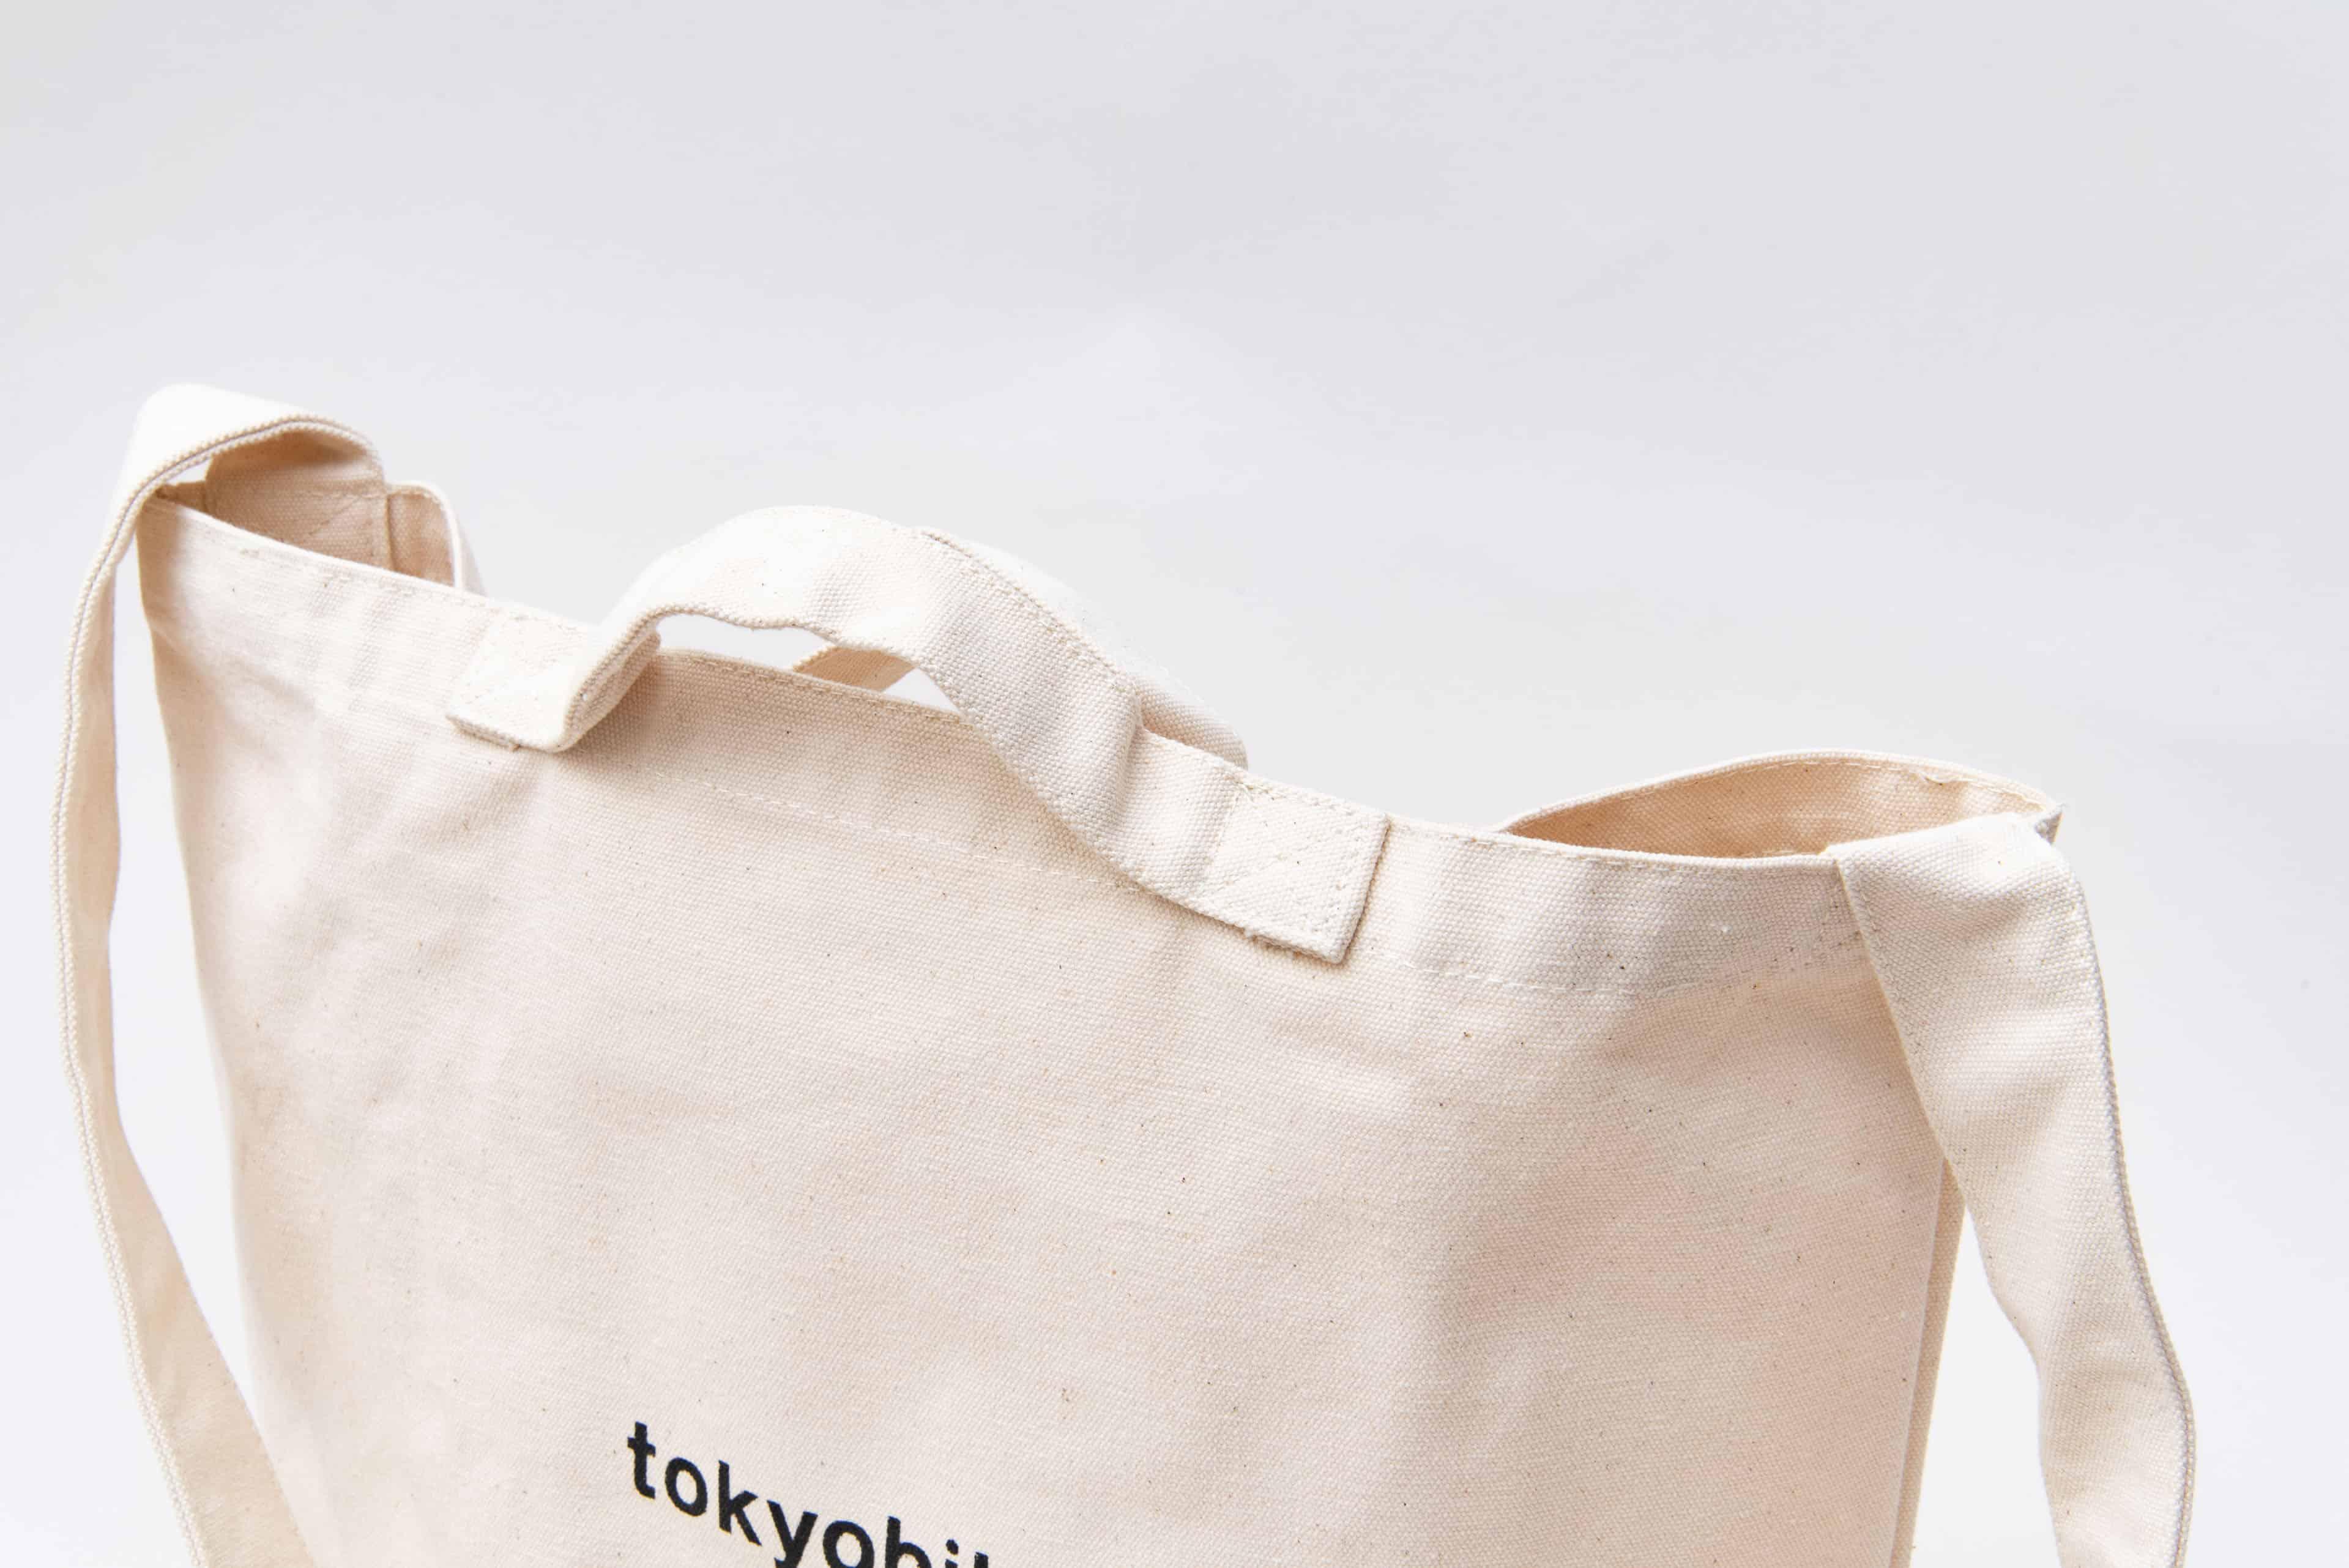 tokyobike tote bag